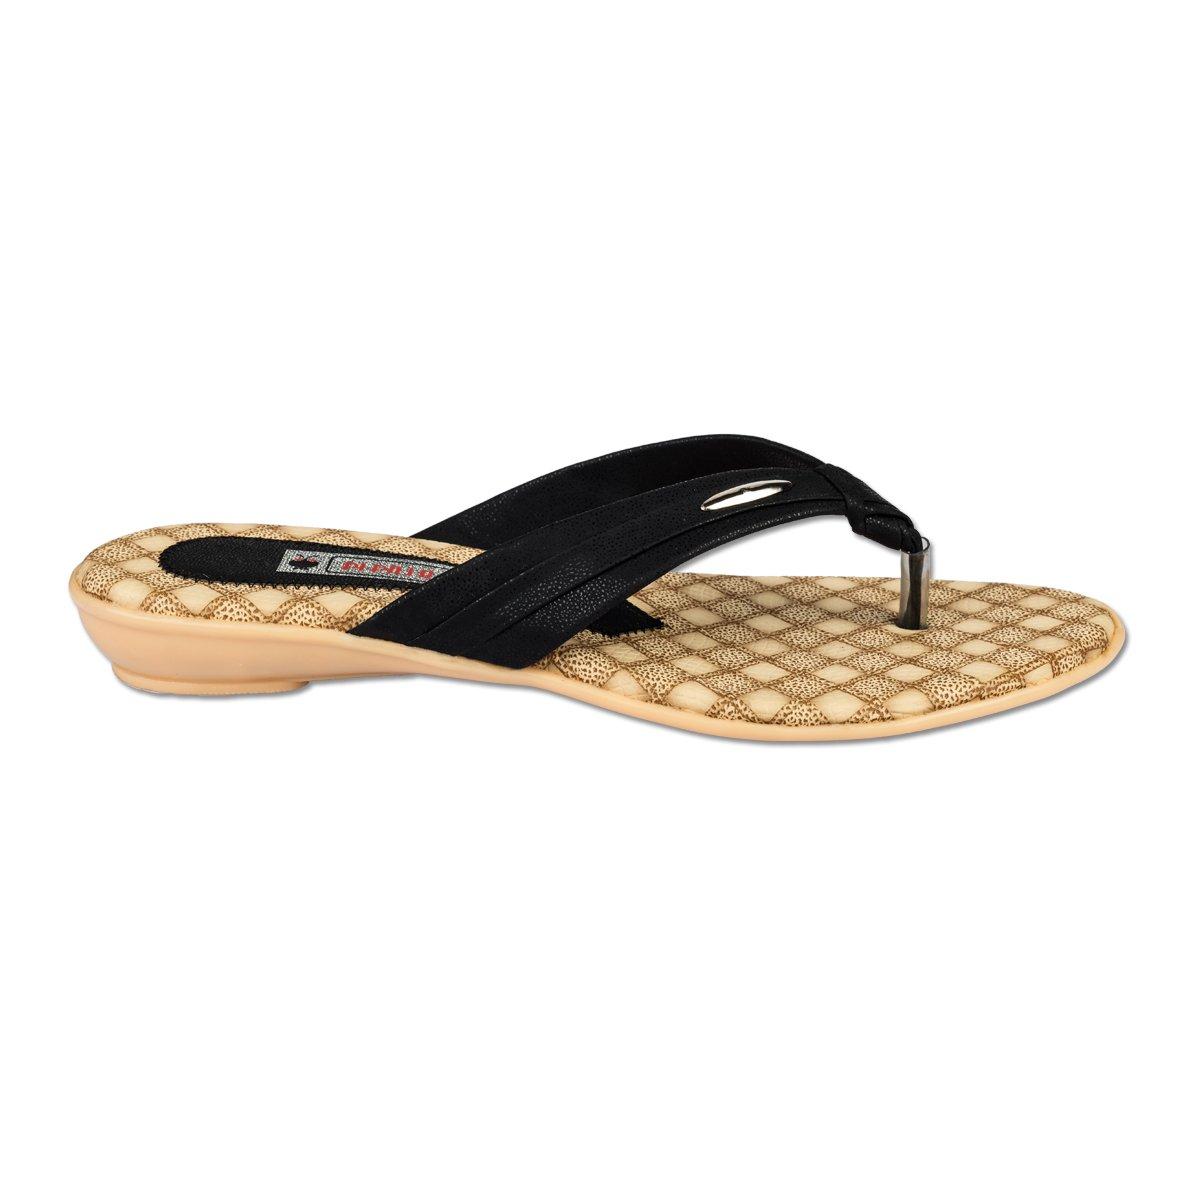 Womens sandals flipkart -  Women Sandal Flats Black Shoes Available On Flipkart Https Www Flipkart Com Pipilika Women Black Flats P Itmehz9ypzggrhez Pid Sndehz9yyskezb69